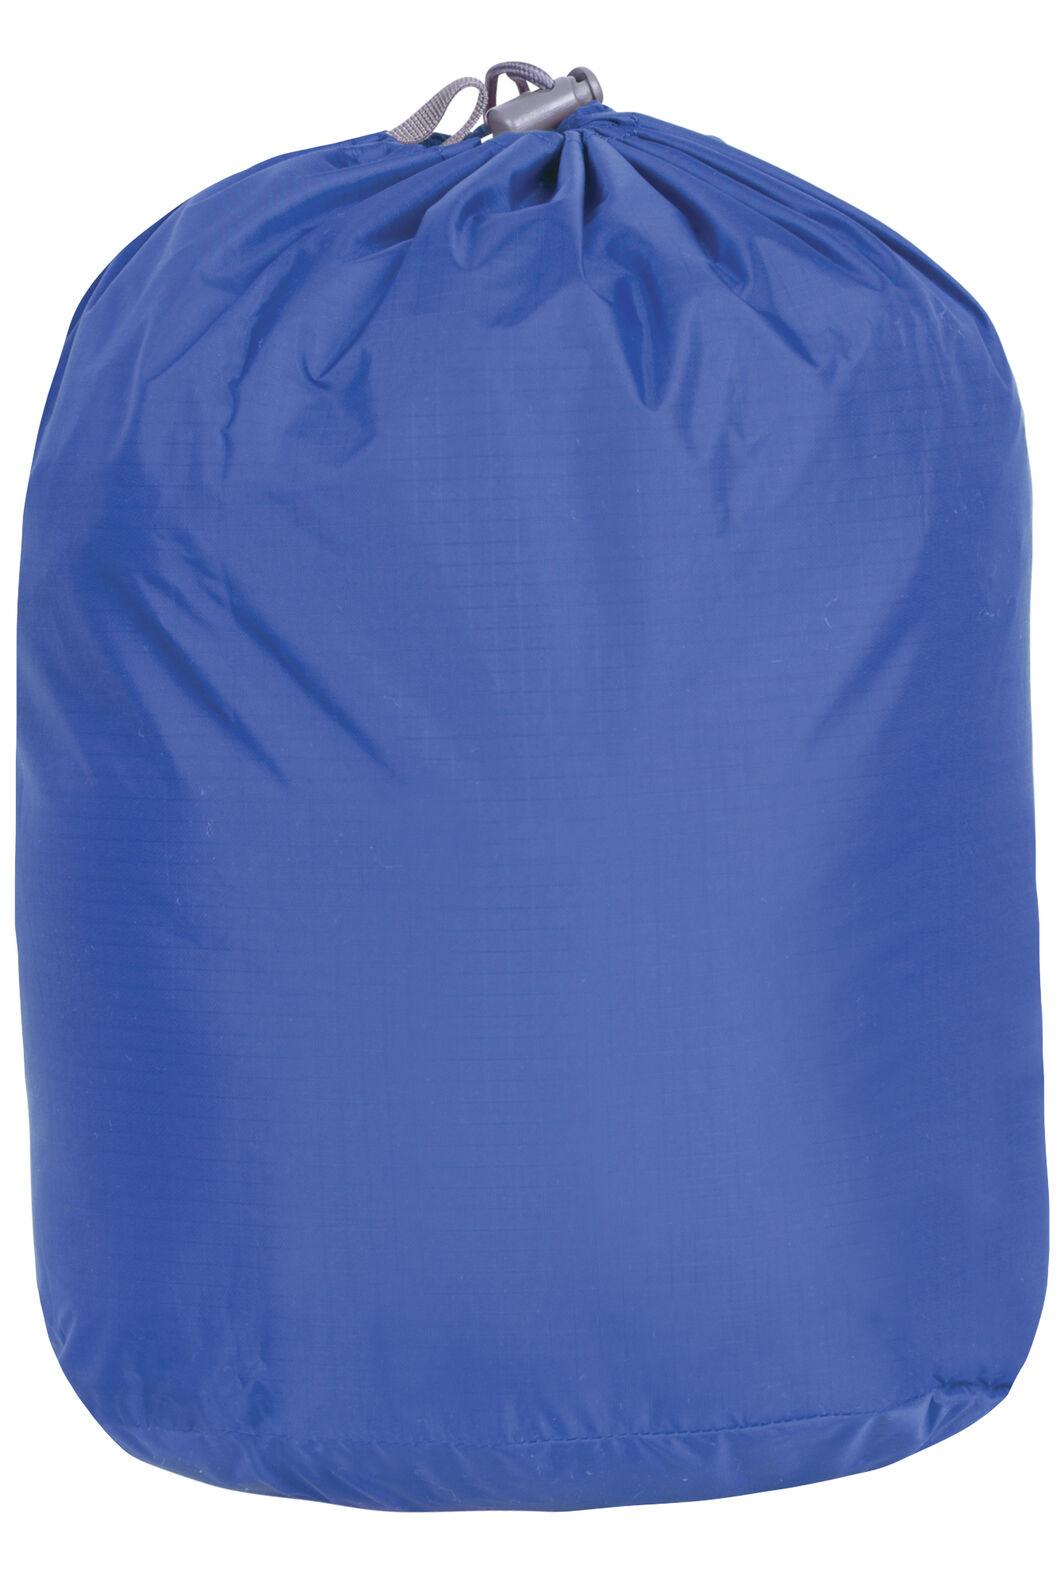 Macpac Large Stuff Sack, Sodalite Blue, hi-res